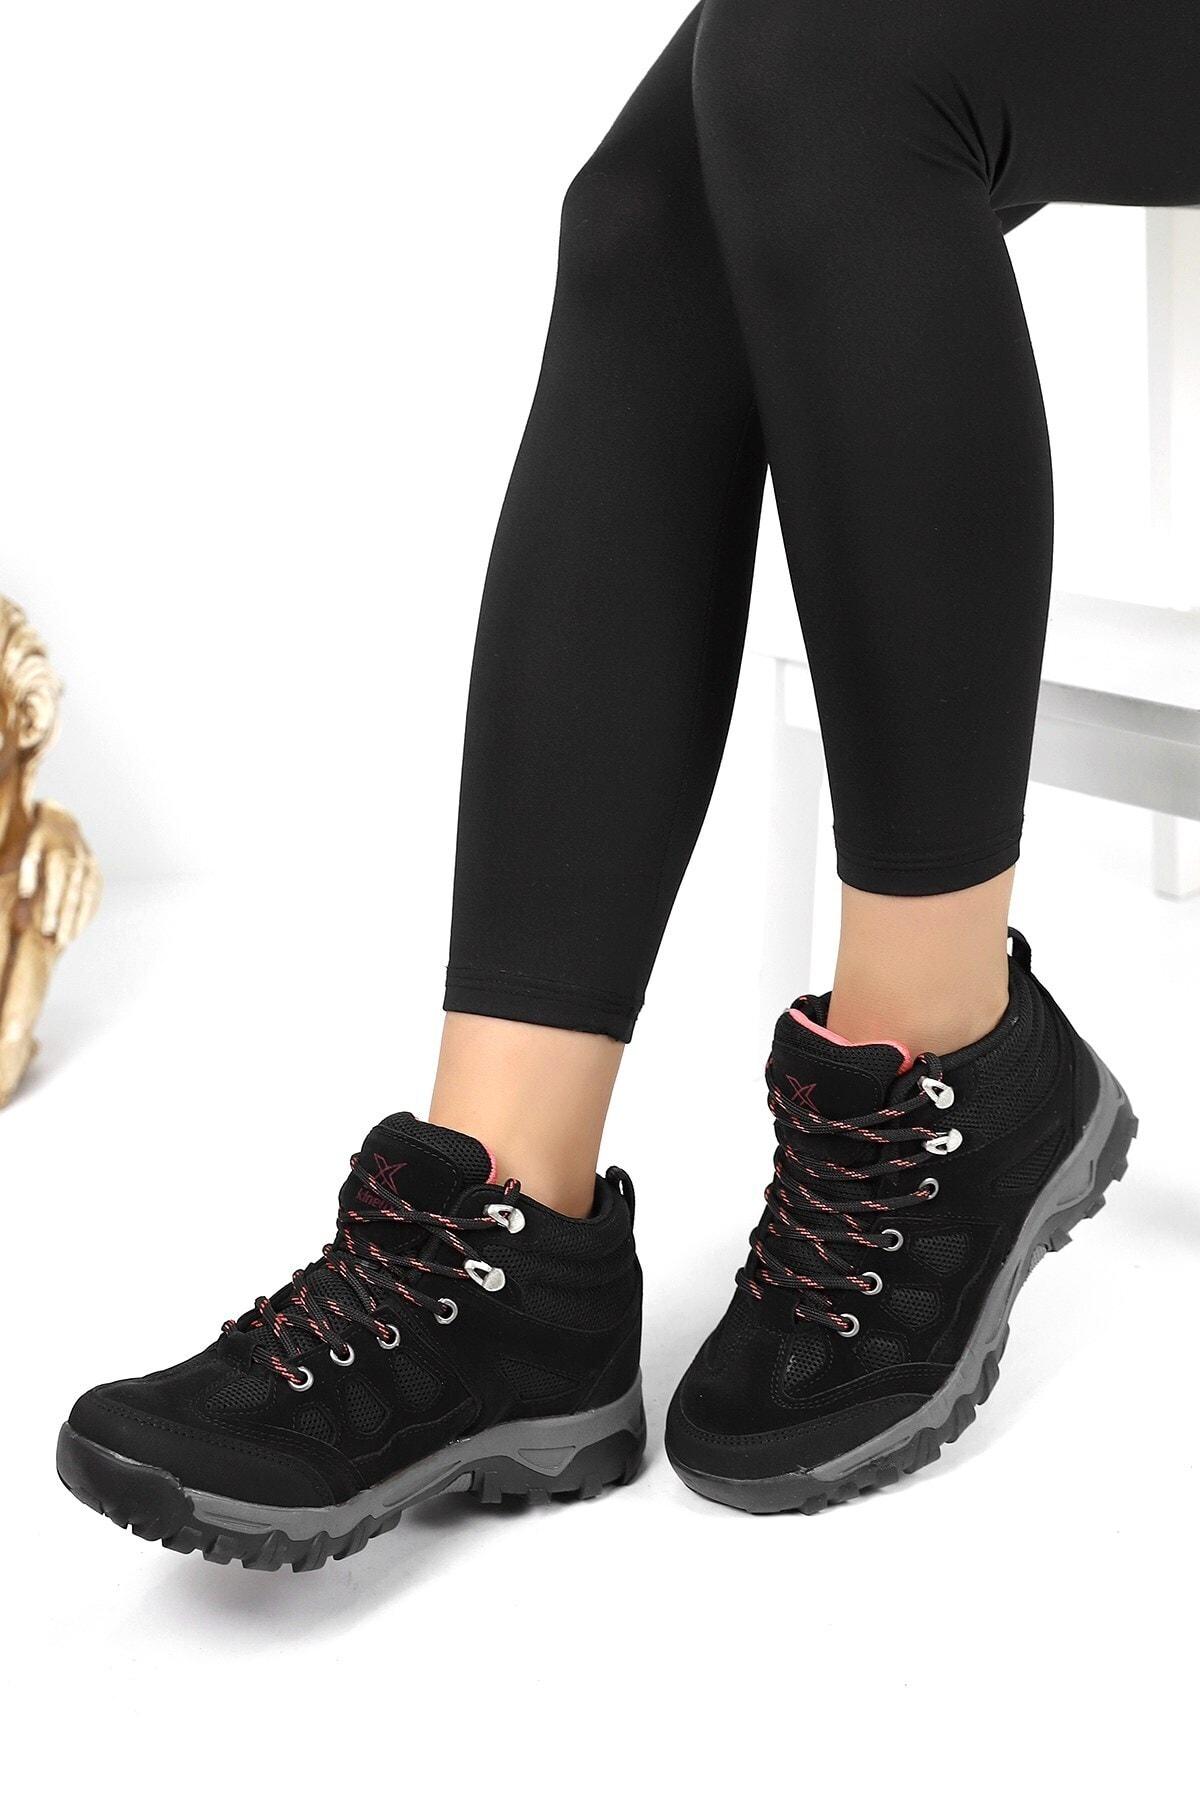 HIKER HI W 9PR Siyah Kadın Outdoor Ayakkabı 100417562